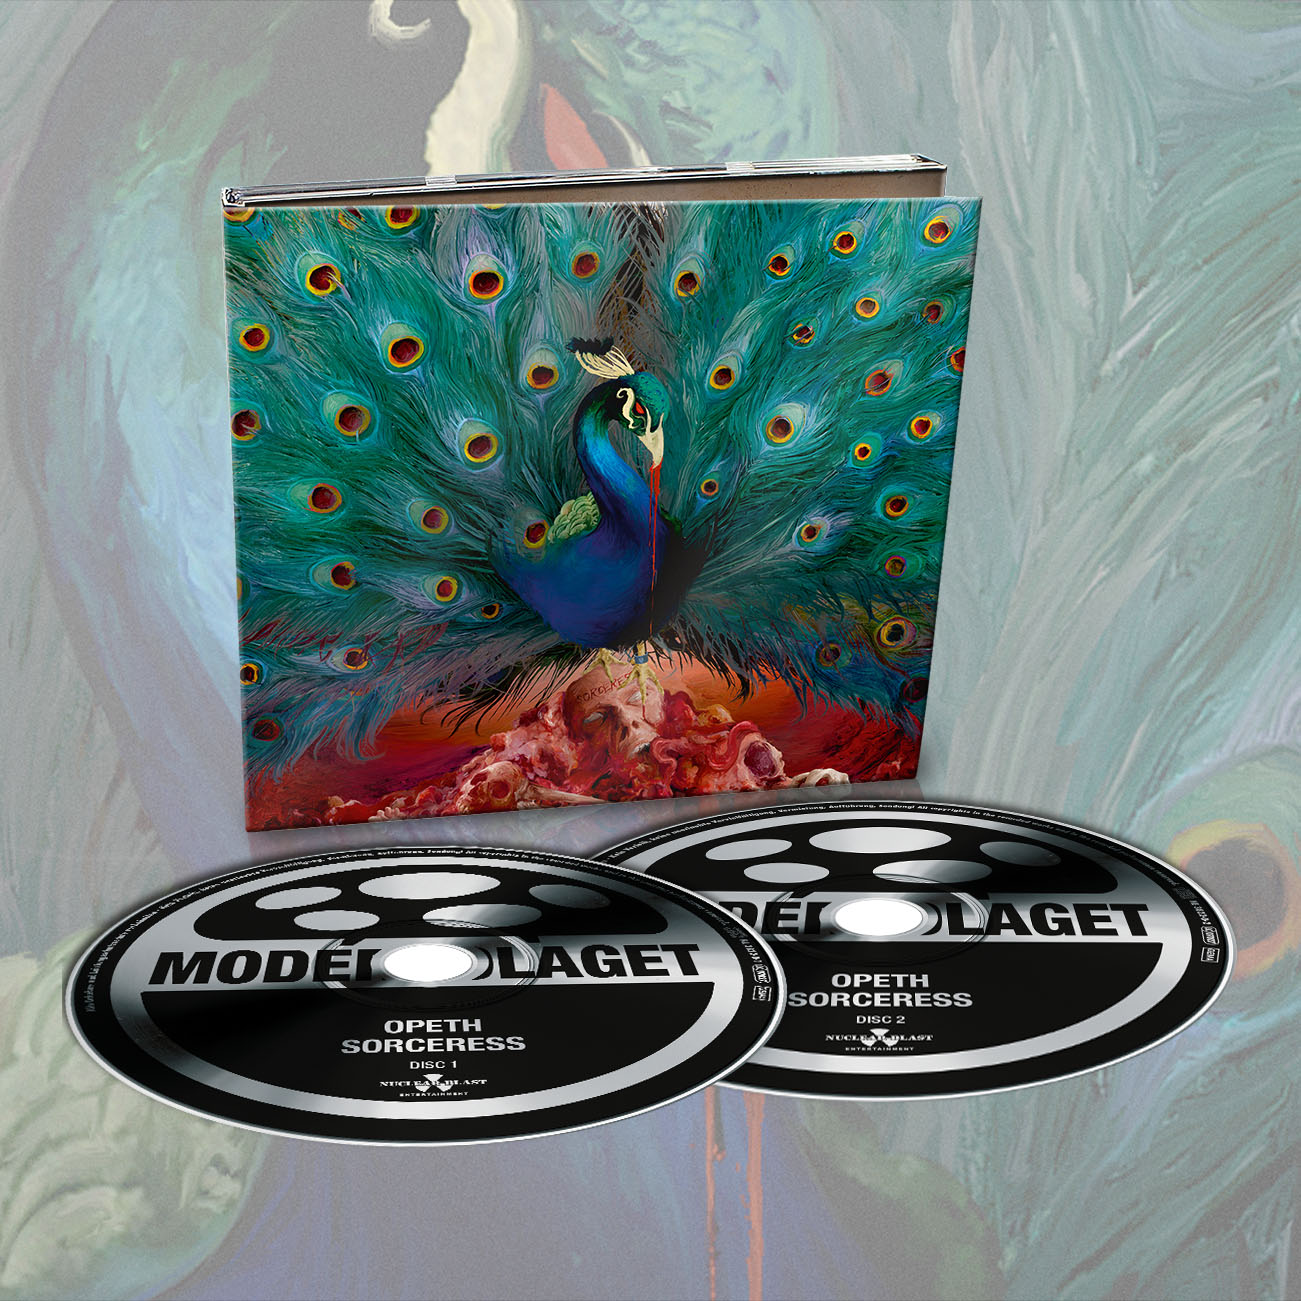 Opeth - 'Sorceress' Limited Edition Digipak - Opeth